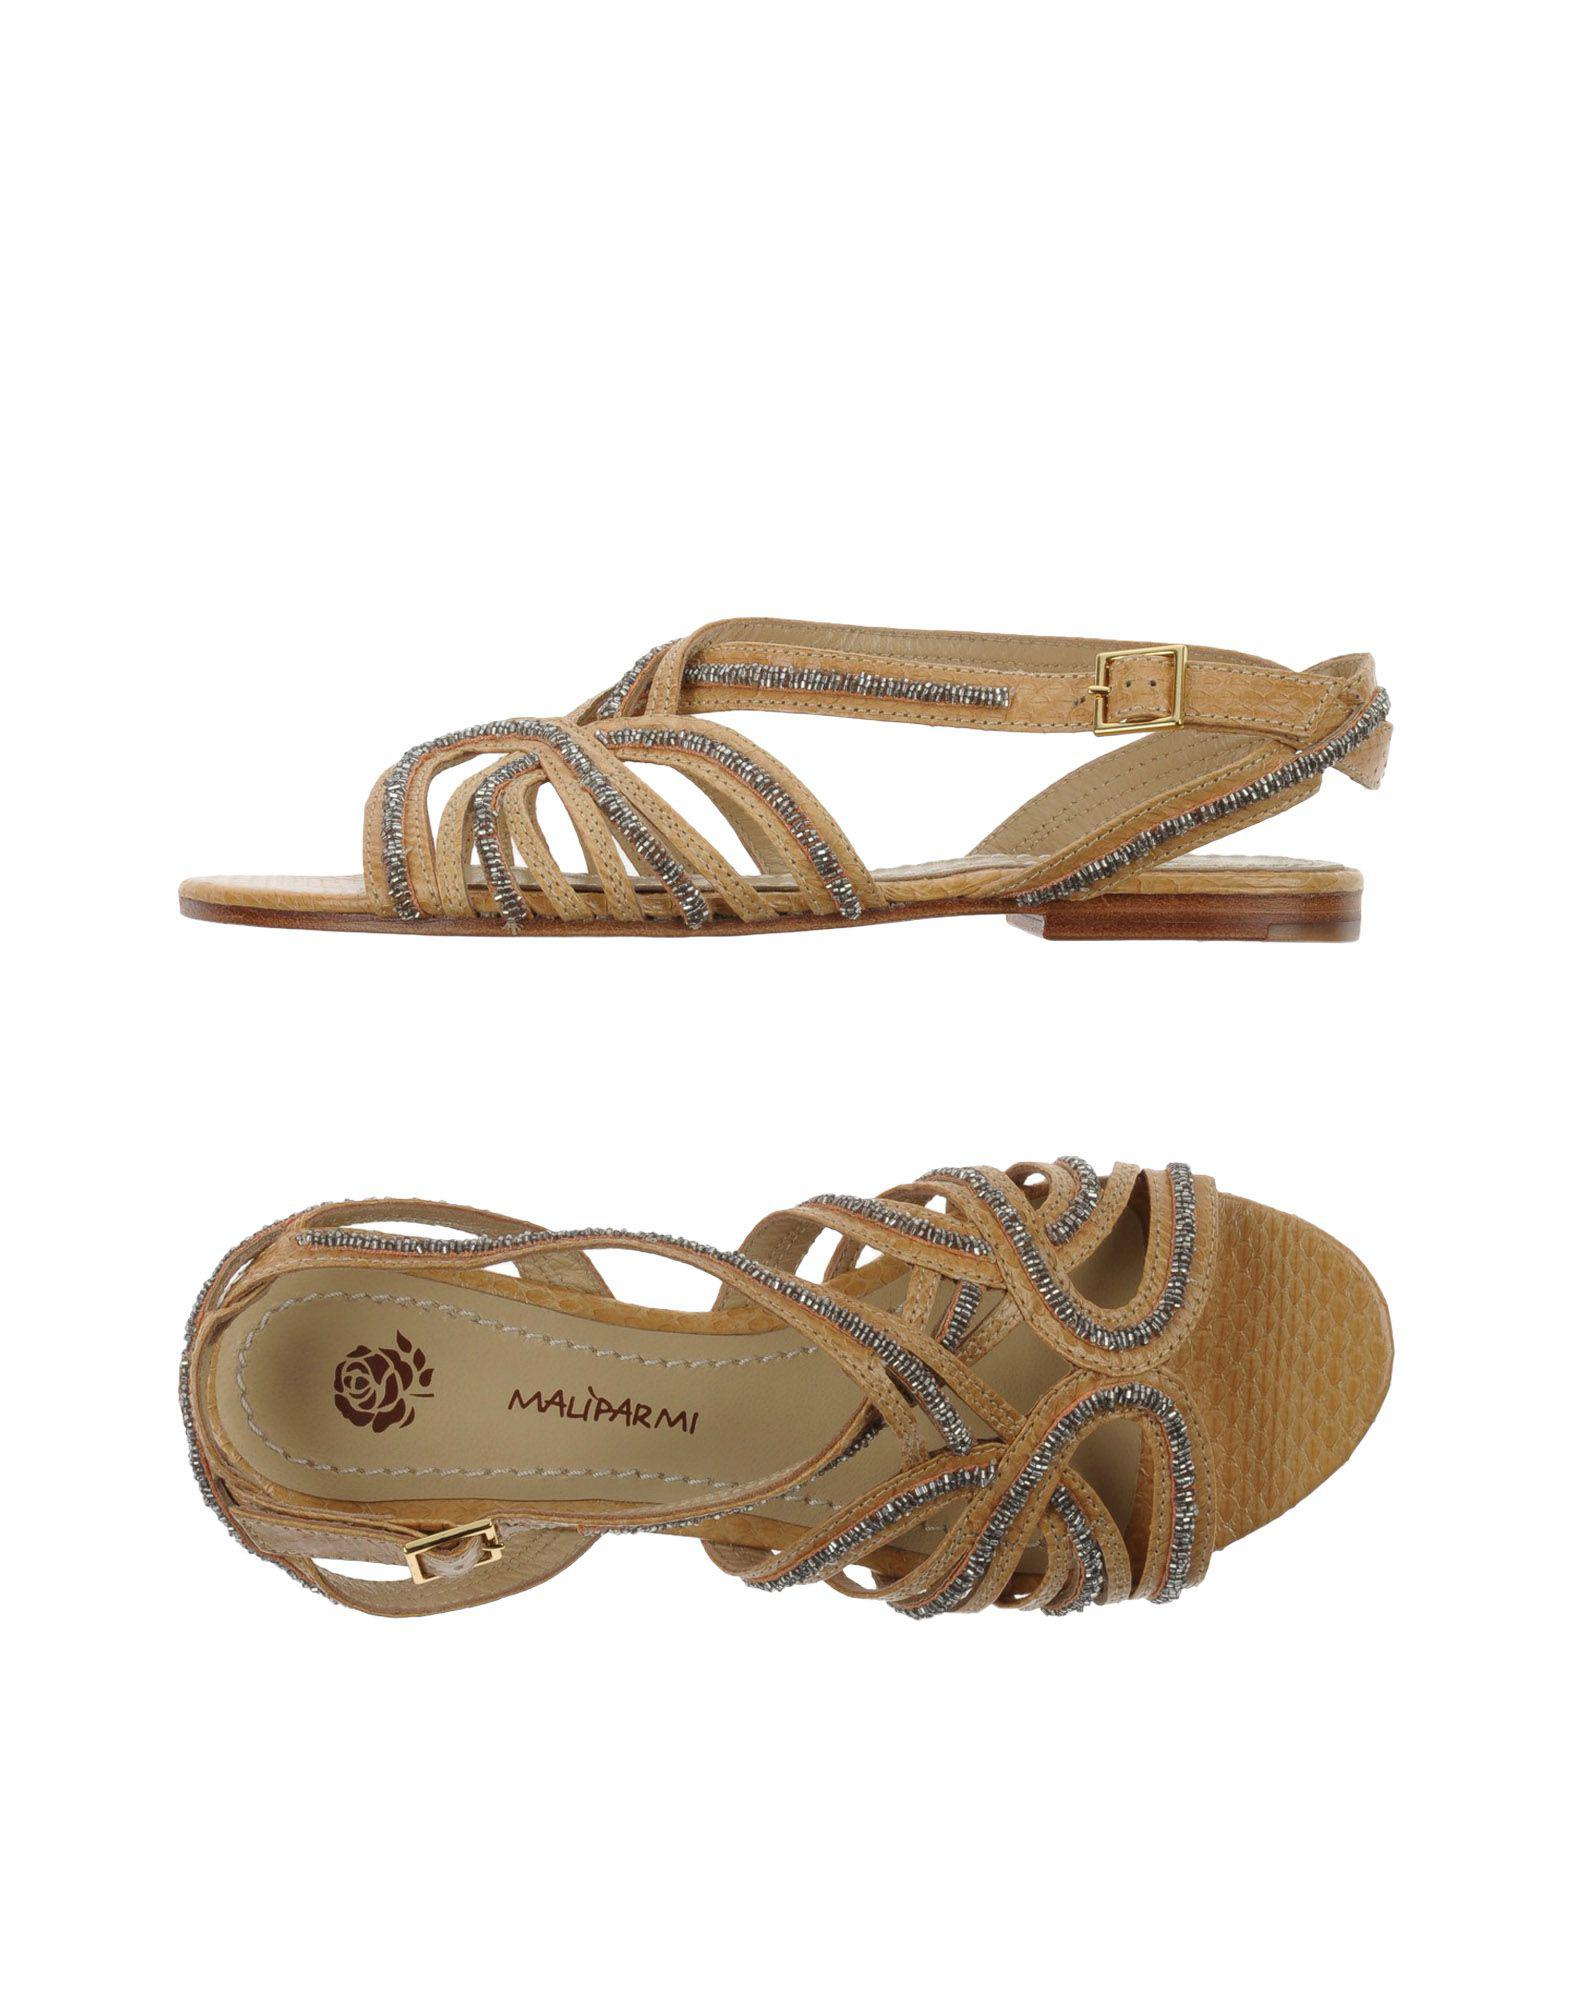 bfe5a8883dec7 Lyst - Maliparmi Sandals in Natural